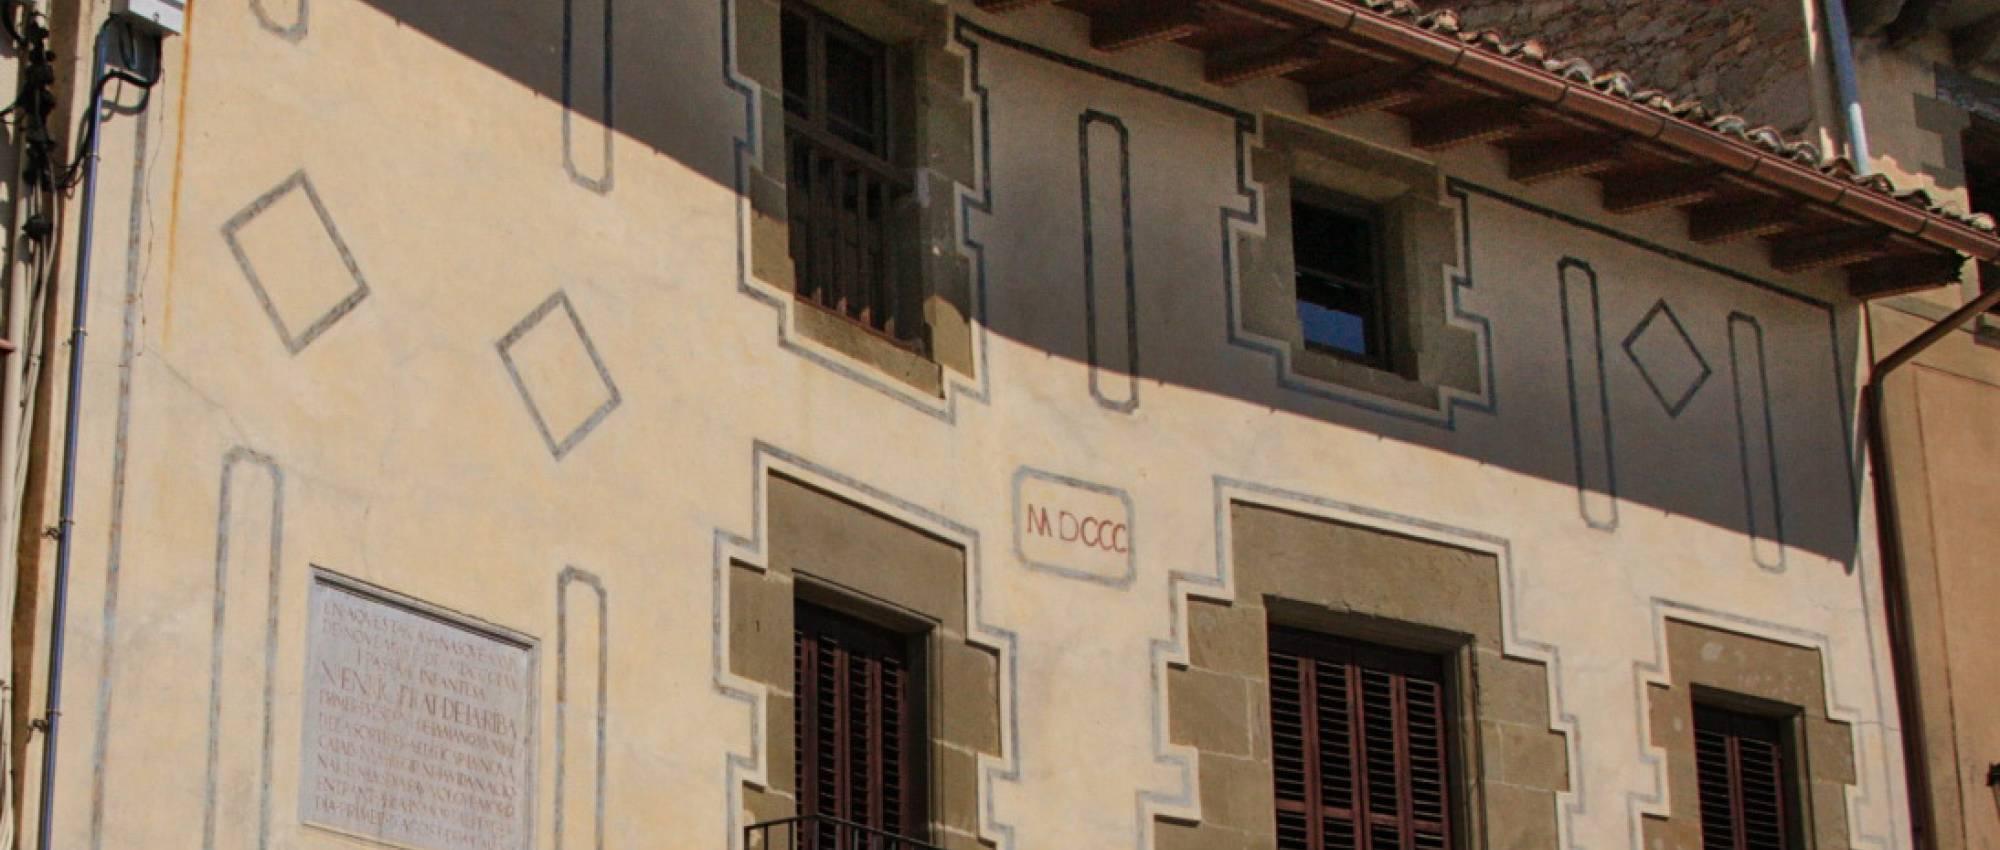 Casa Prat de la Riba. Amadalvarez / Wikimedia Commons. CC BY-SA 3.0